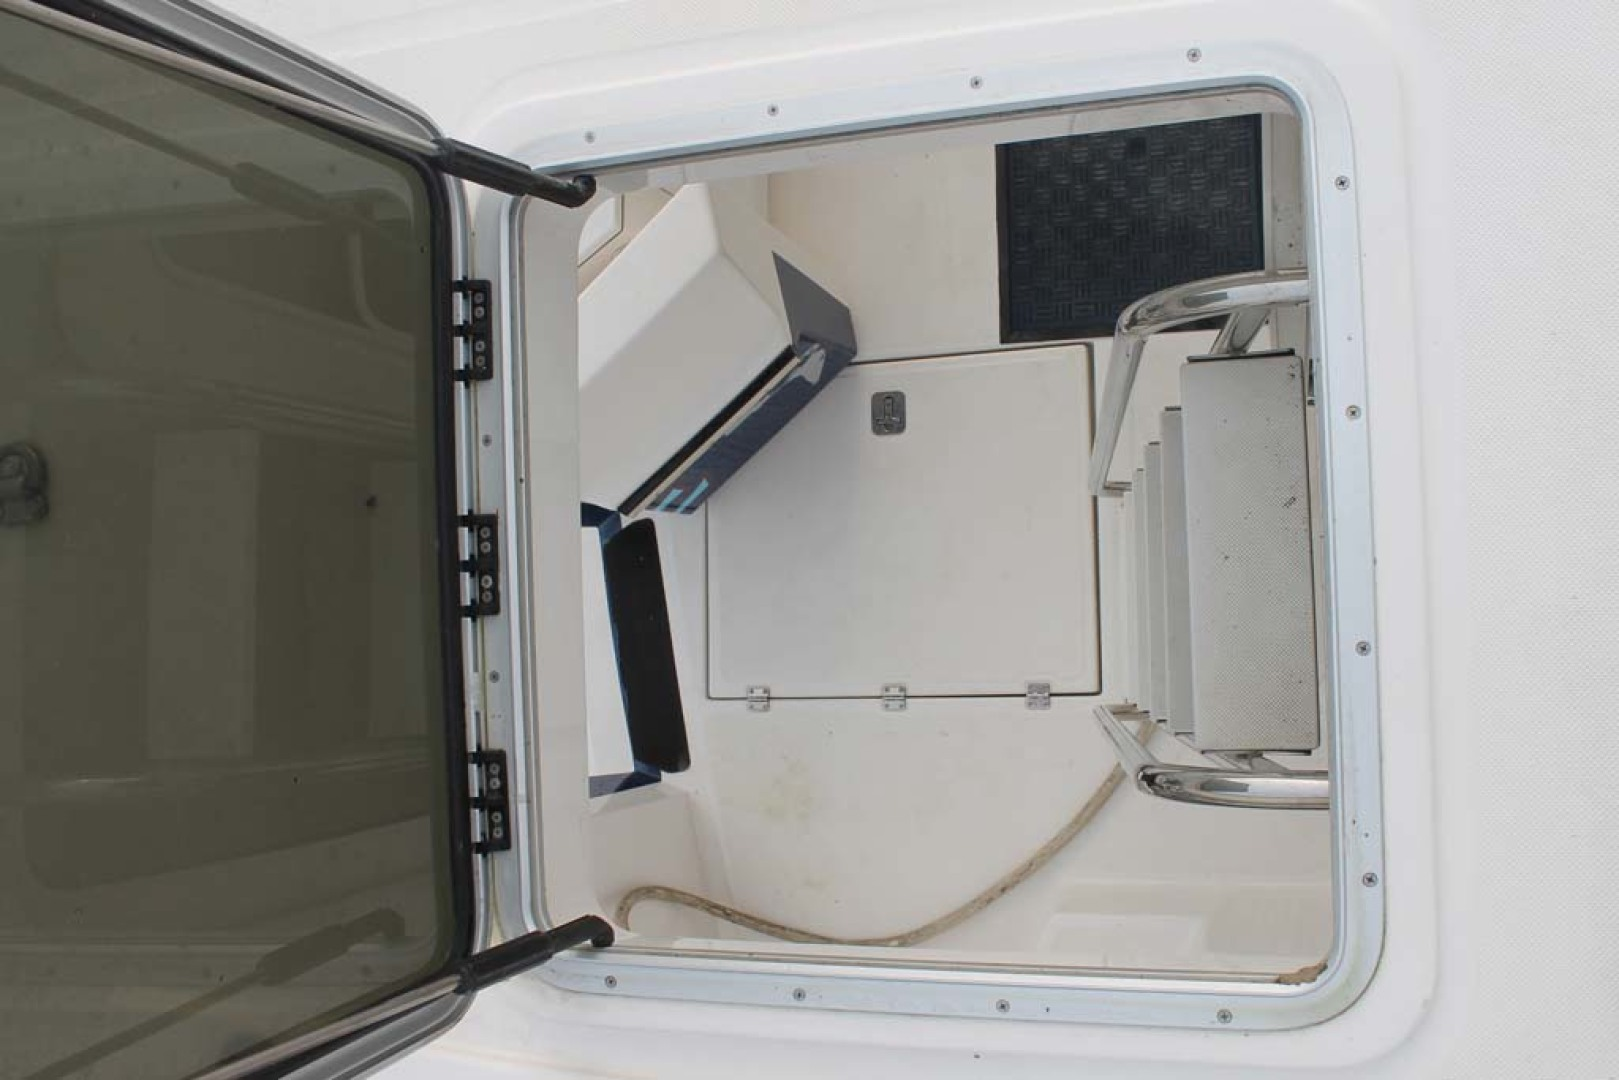 American Tug-Pilothouse 2006-Peregrine Albany-New York-United States-Upper Deck Hatch-1063168 | Thumbnail